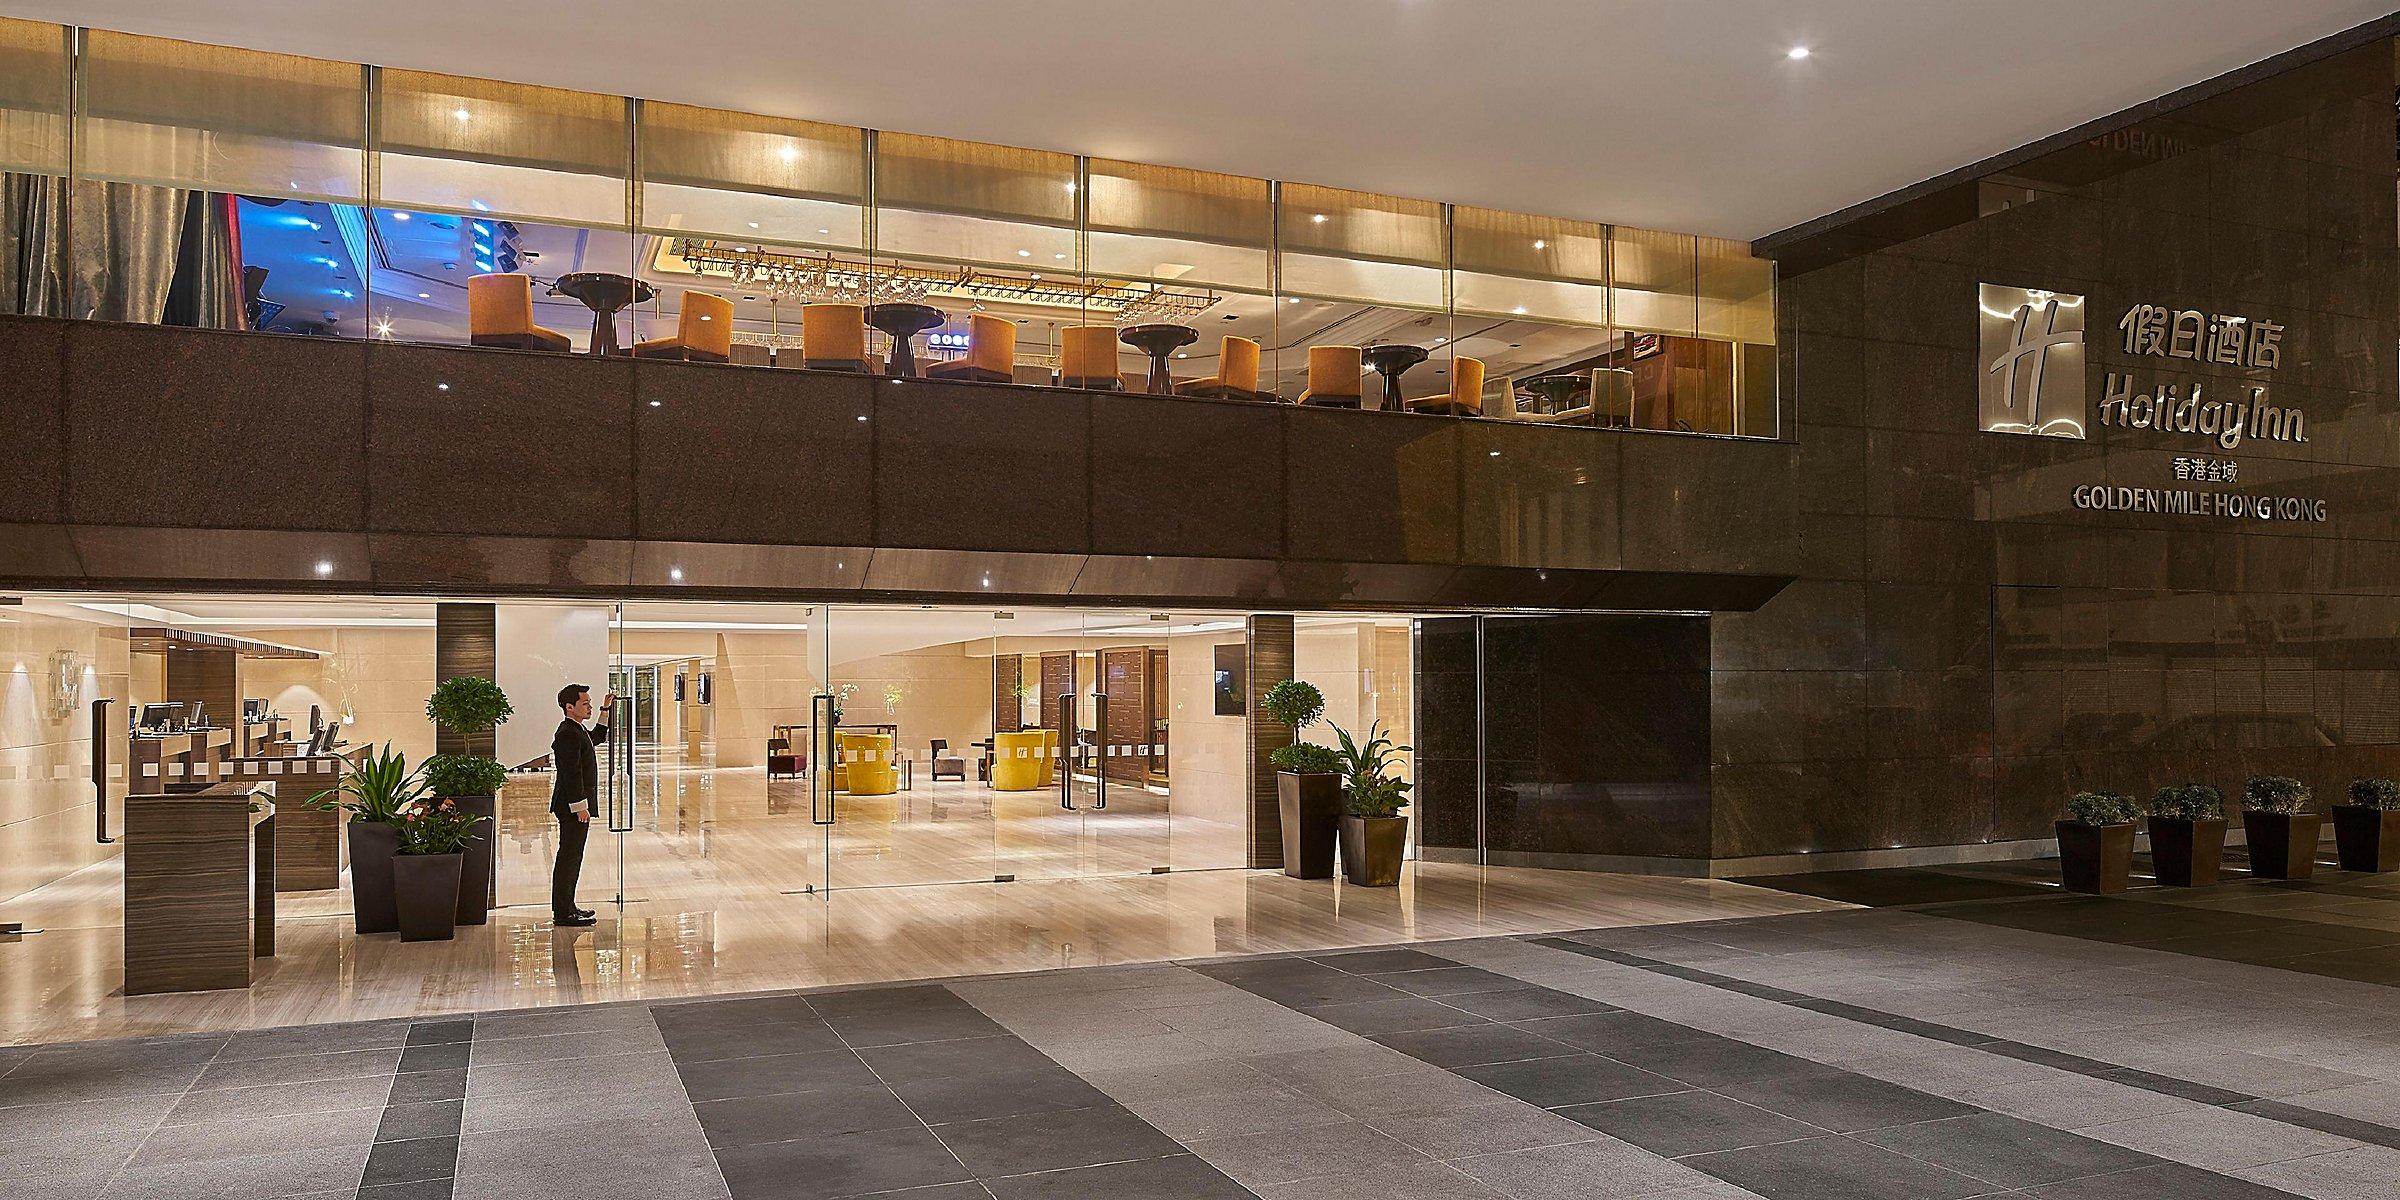 Hotels in Tsim Sha Tsui, Kowloon | Holiday Inn Golden Mile